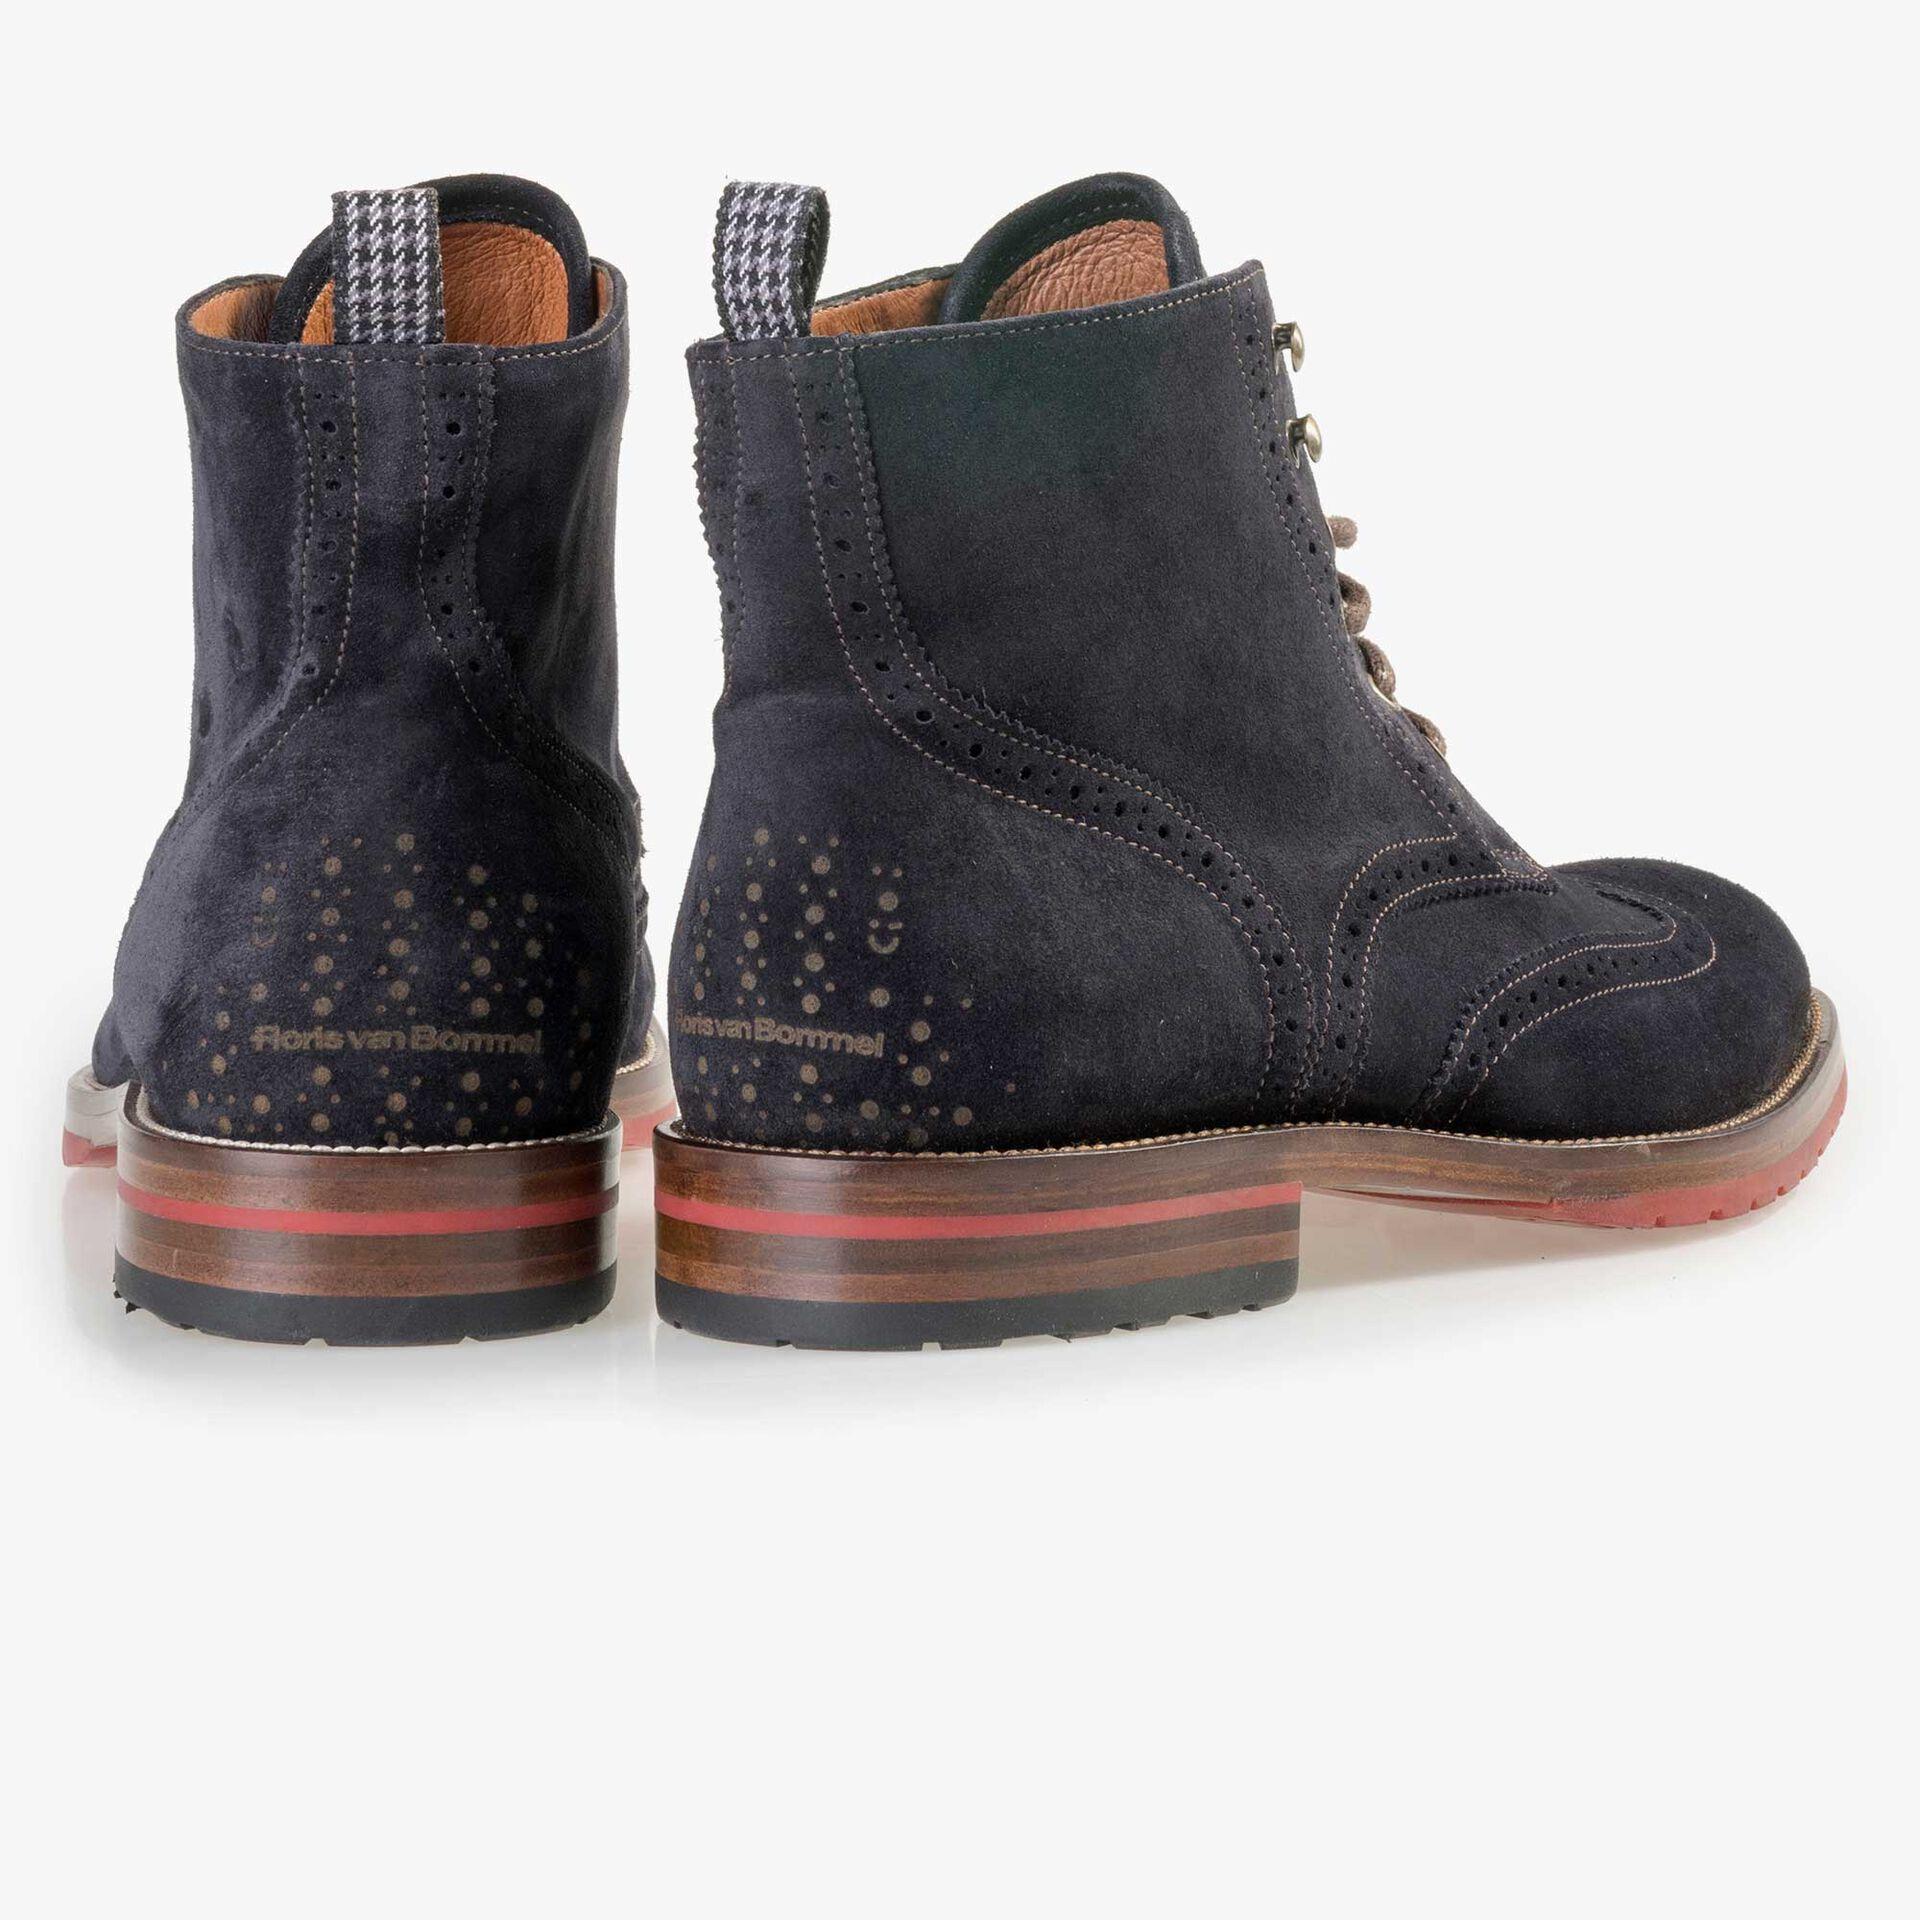 Floris van Bommel men's dark blue suede leather brogue lace boot